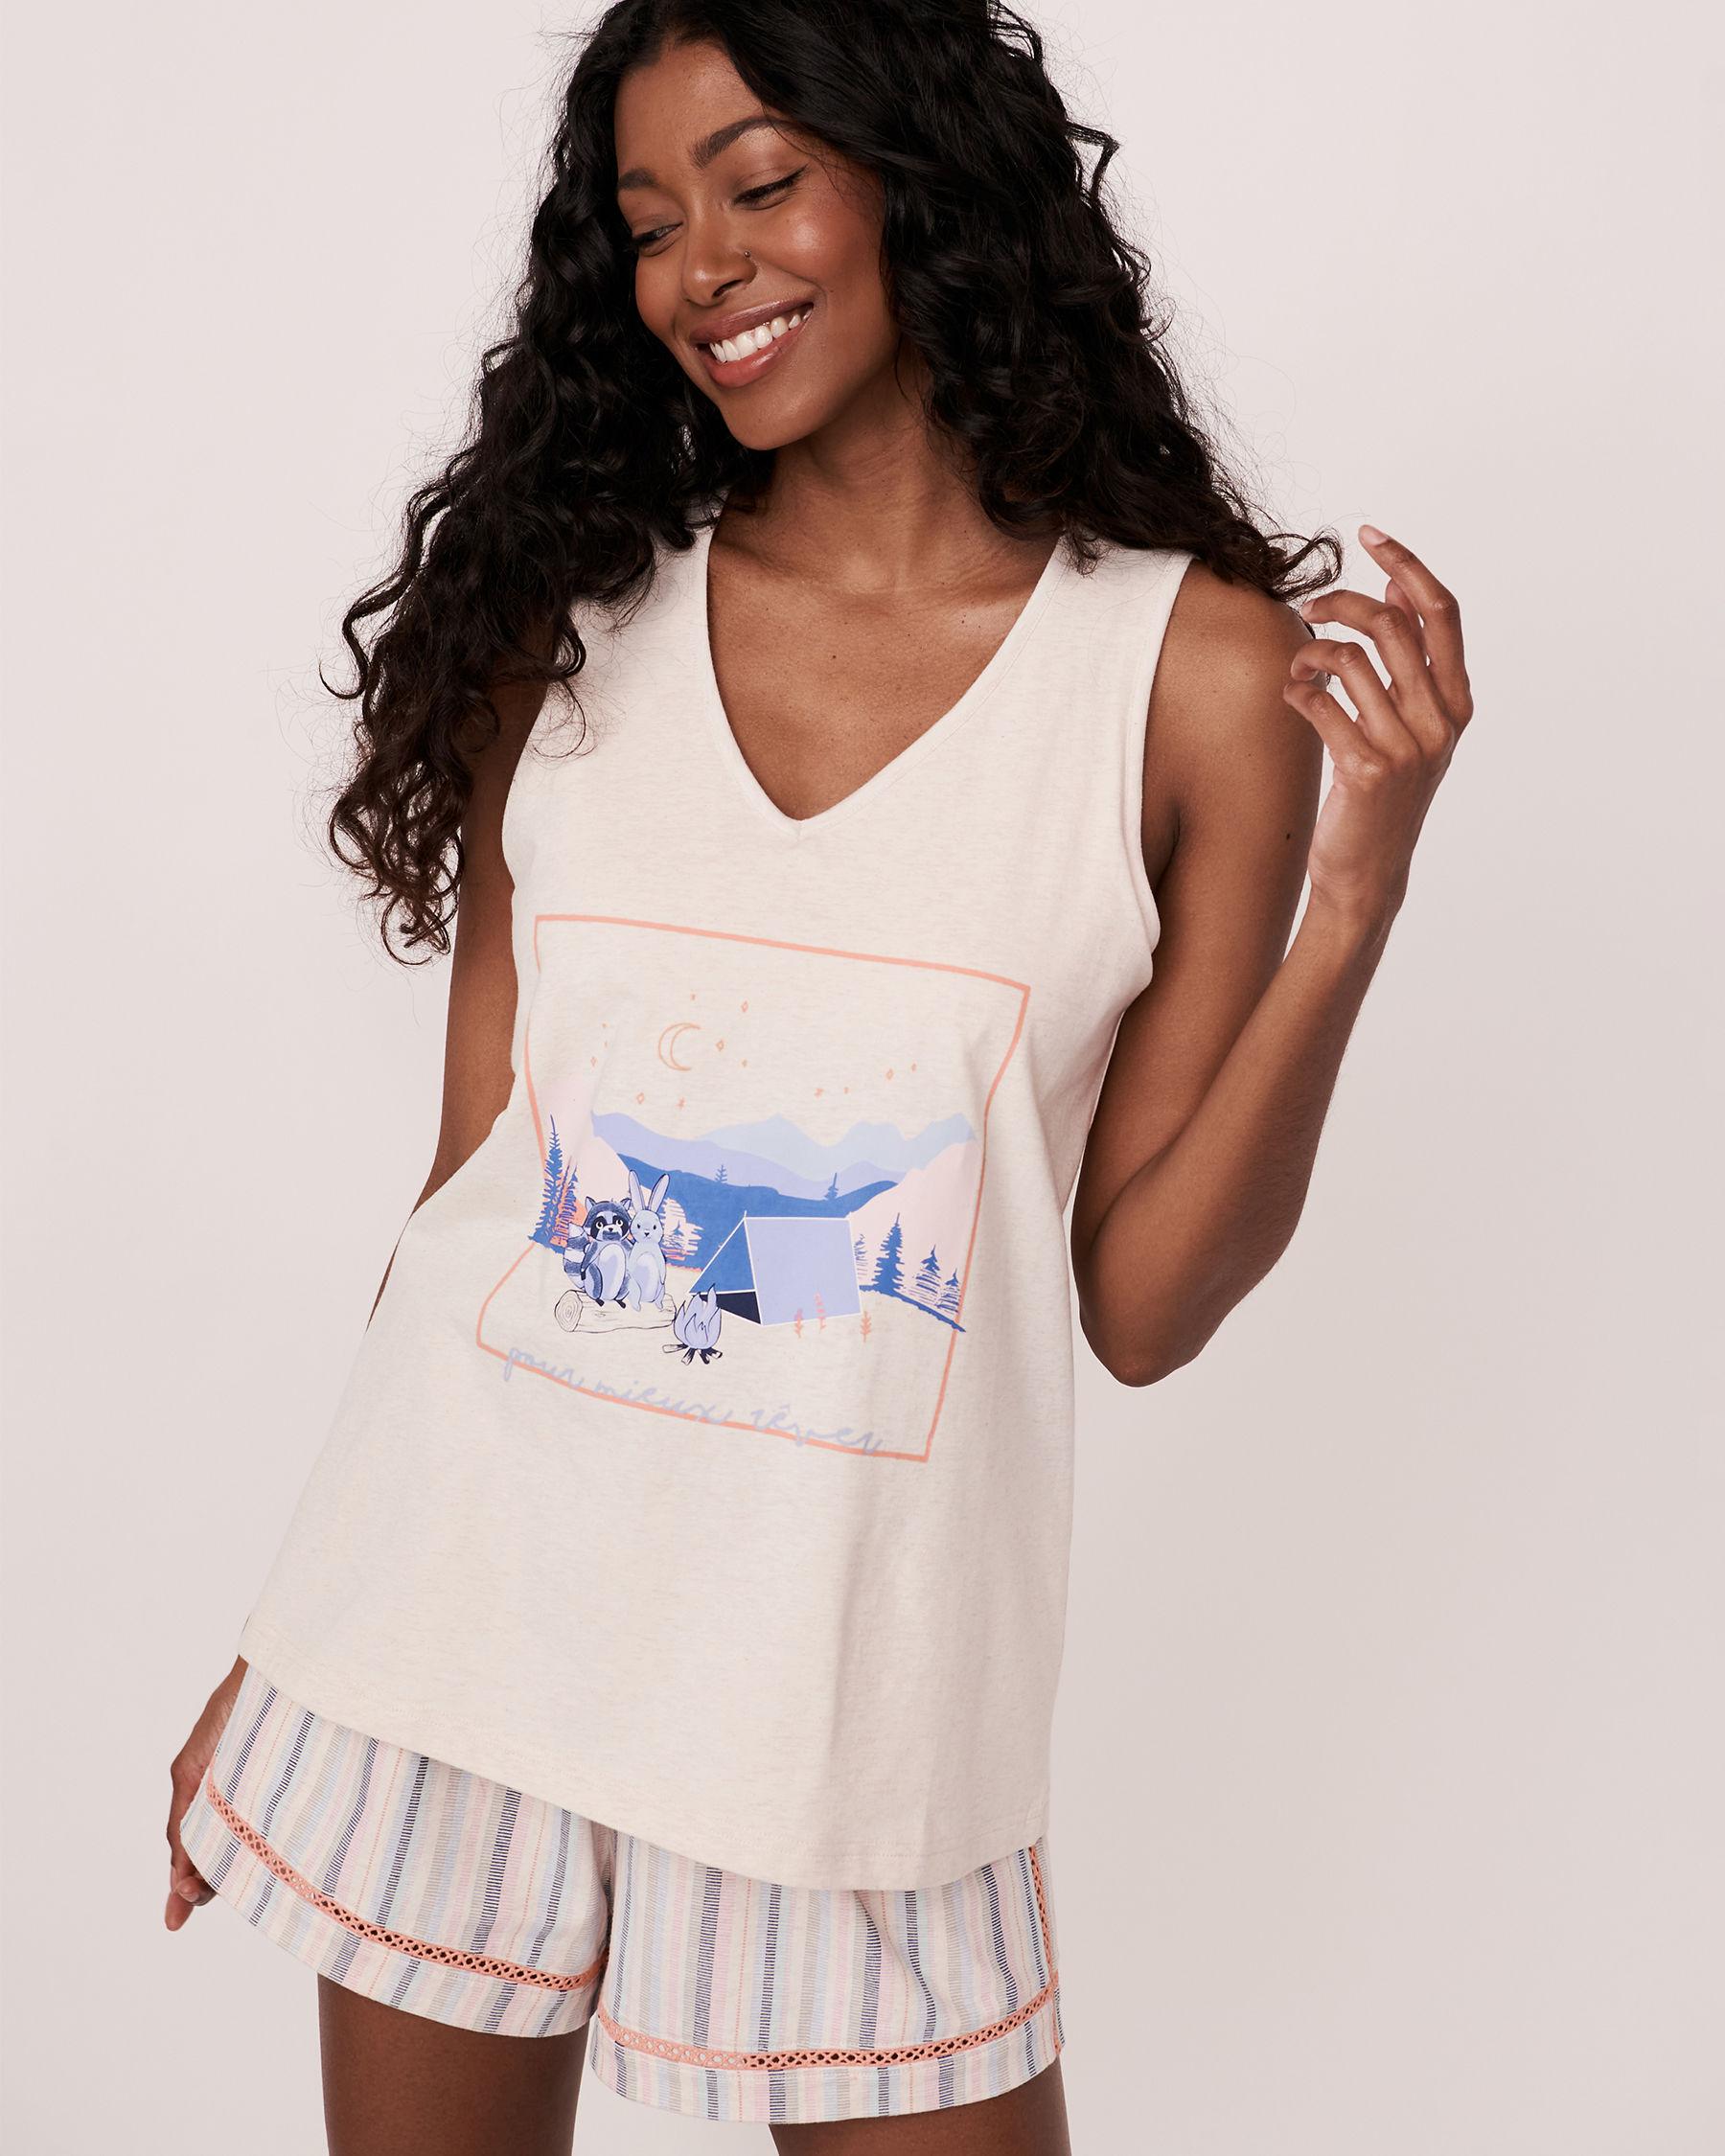 LA VIE EN ROSE Organic Cotton V-neck Cami Grey mix 40100049 - View1